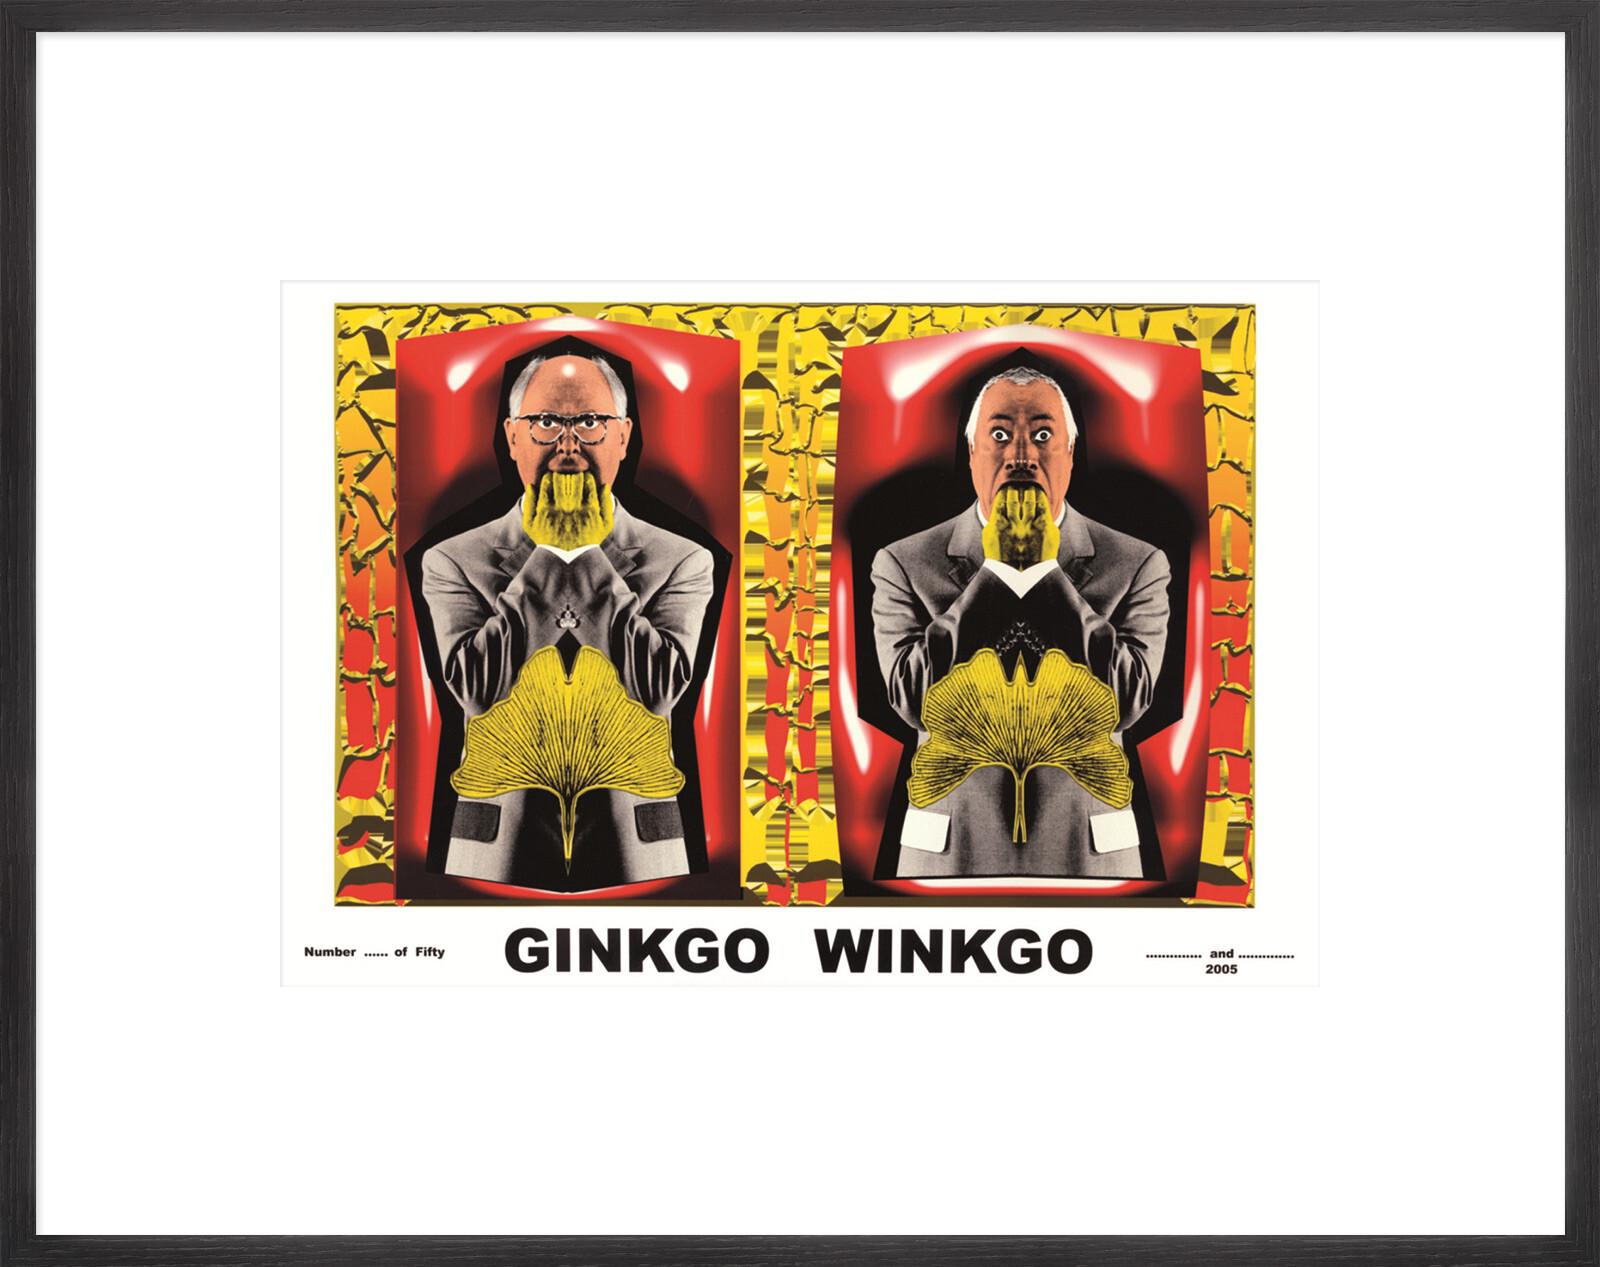 Ginkgo Winkgo - Gilbert & George